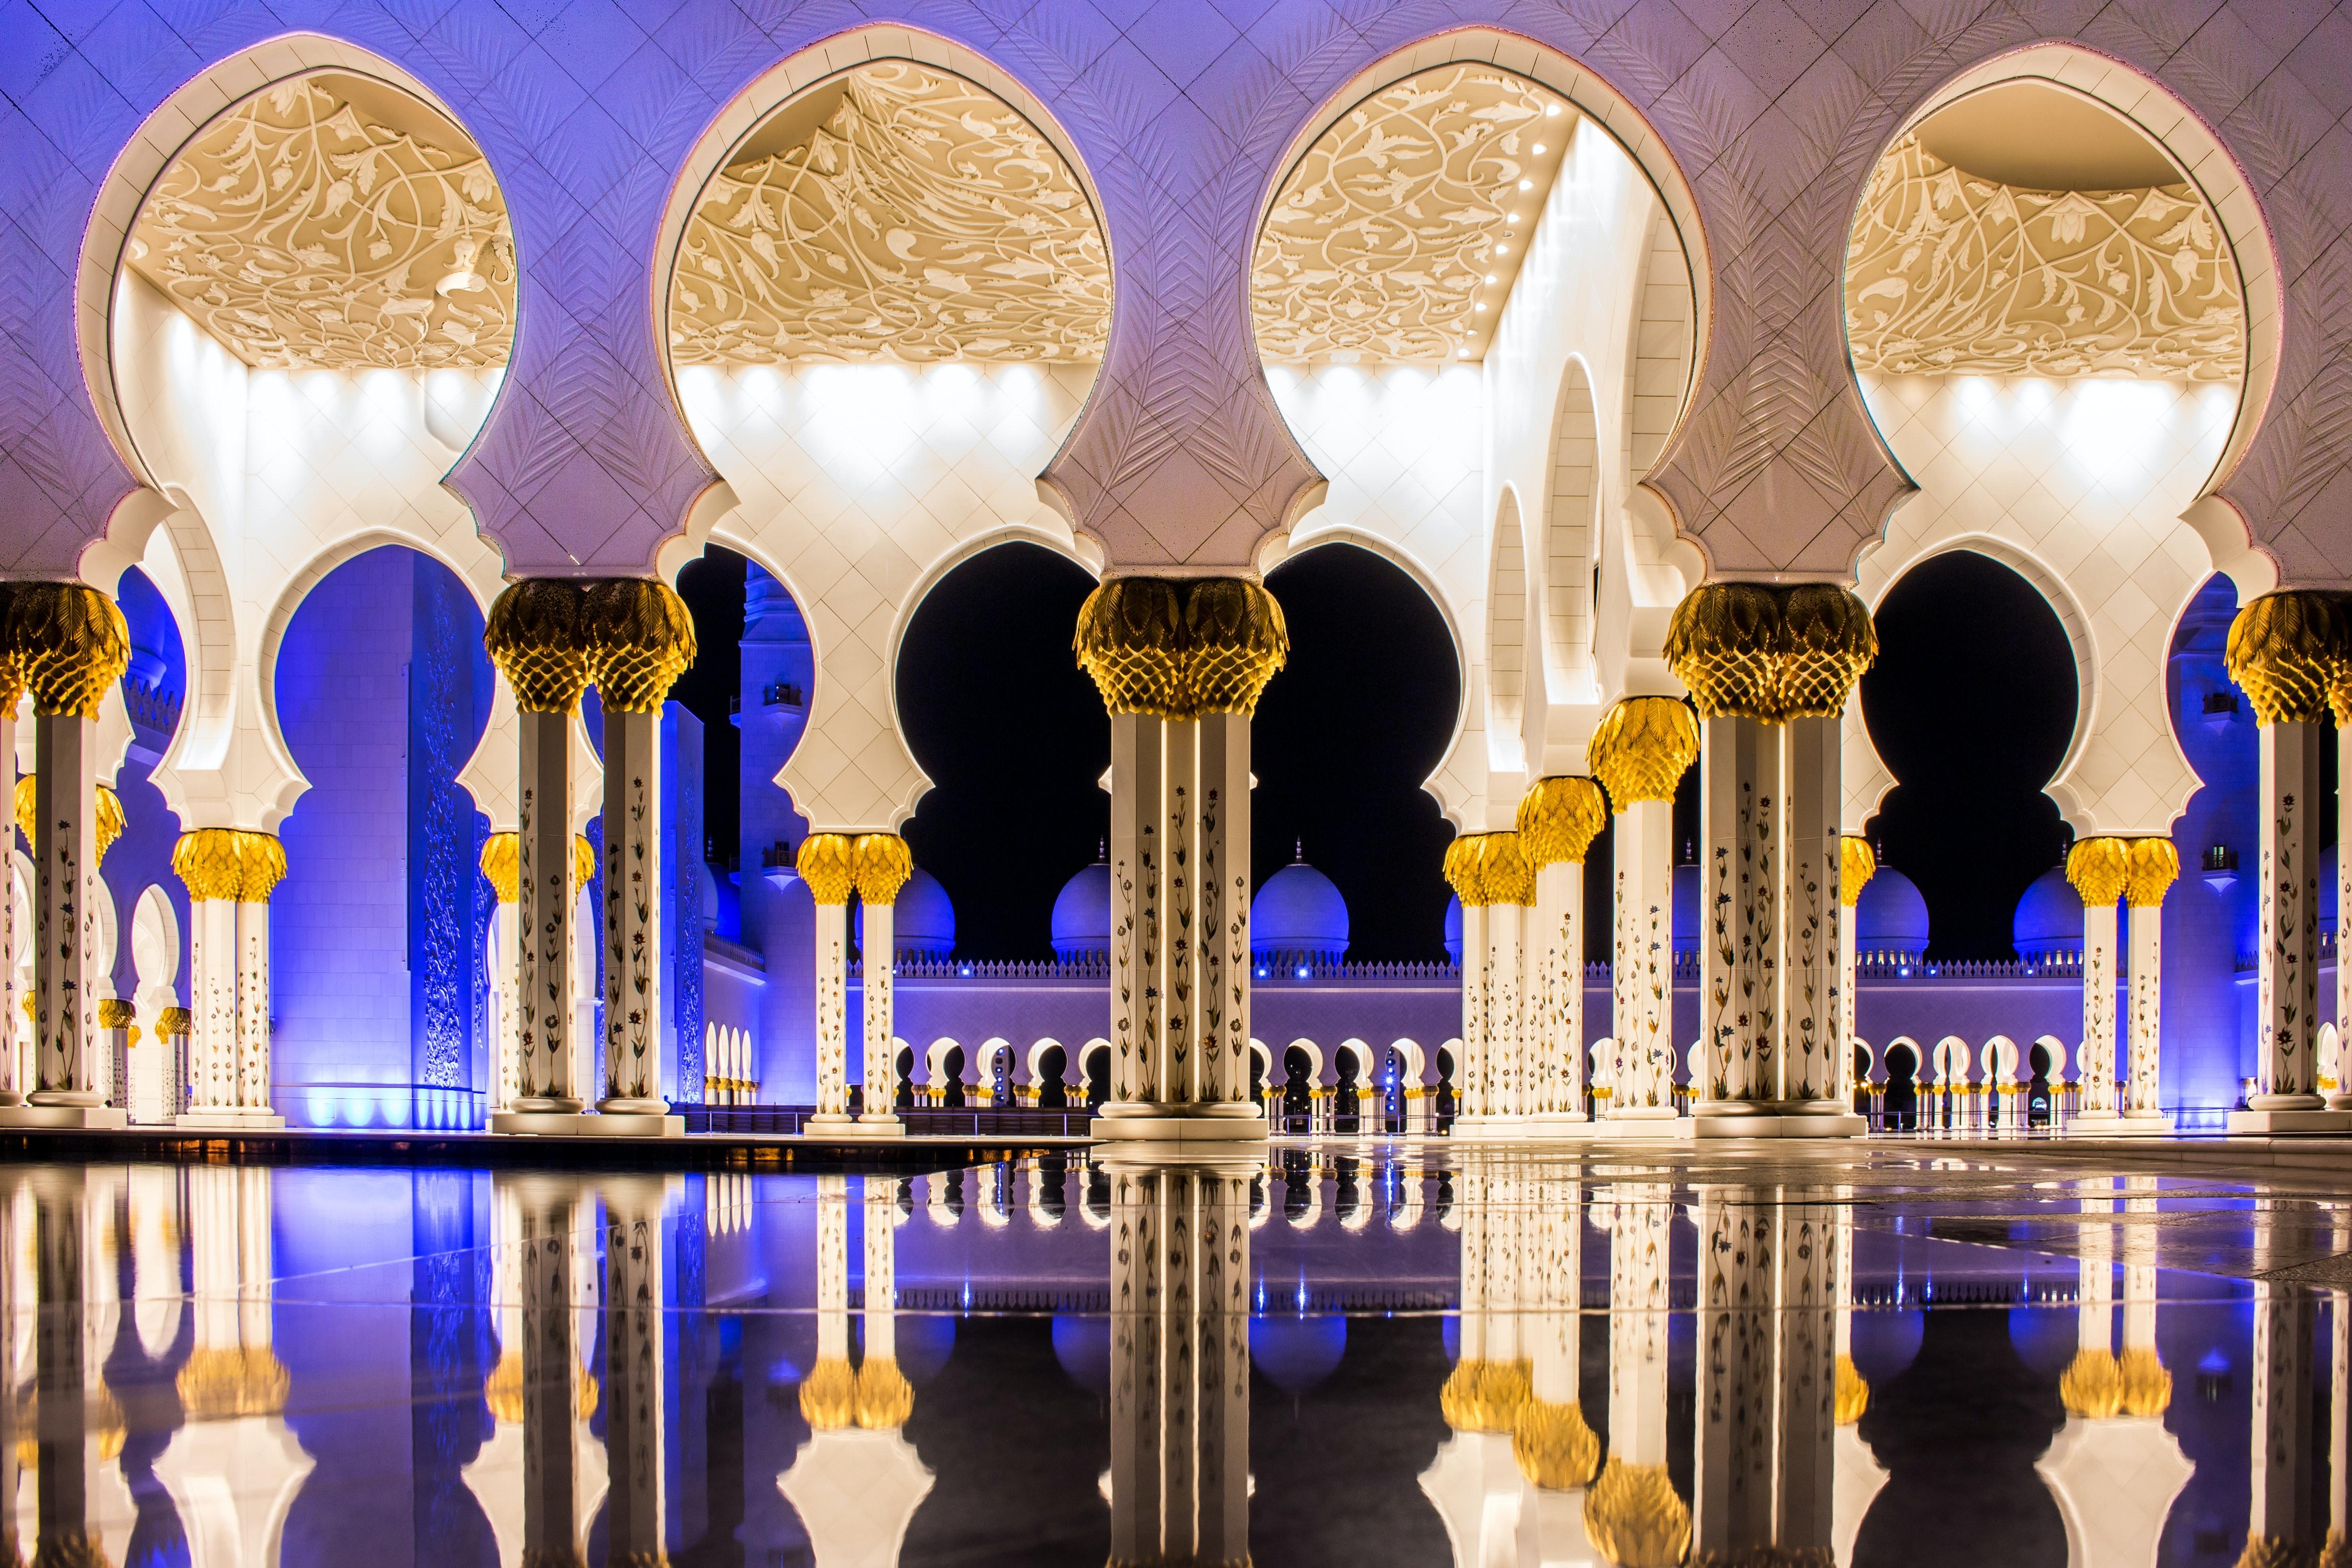 Sheikh Zayed Grand Mosque, Dubai Abu Dhabi tour itinerary